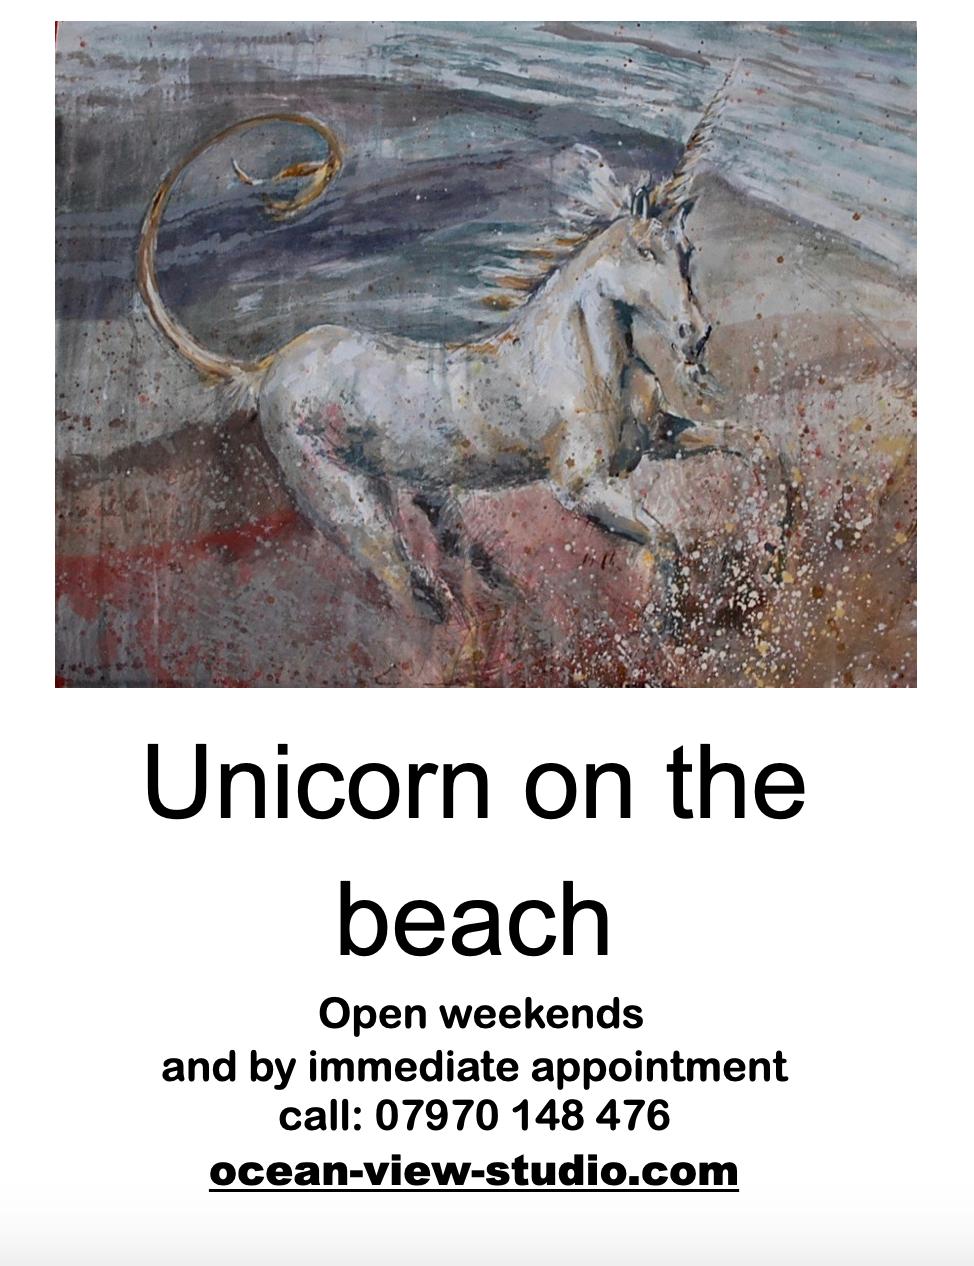 unicorn on the beach